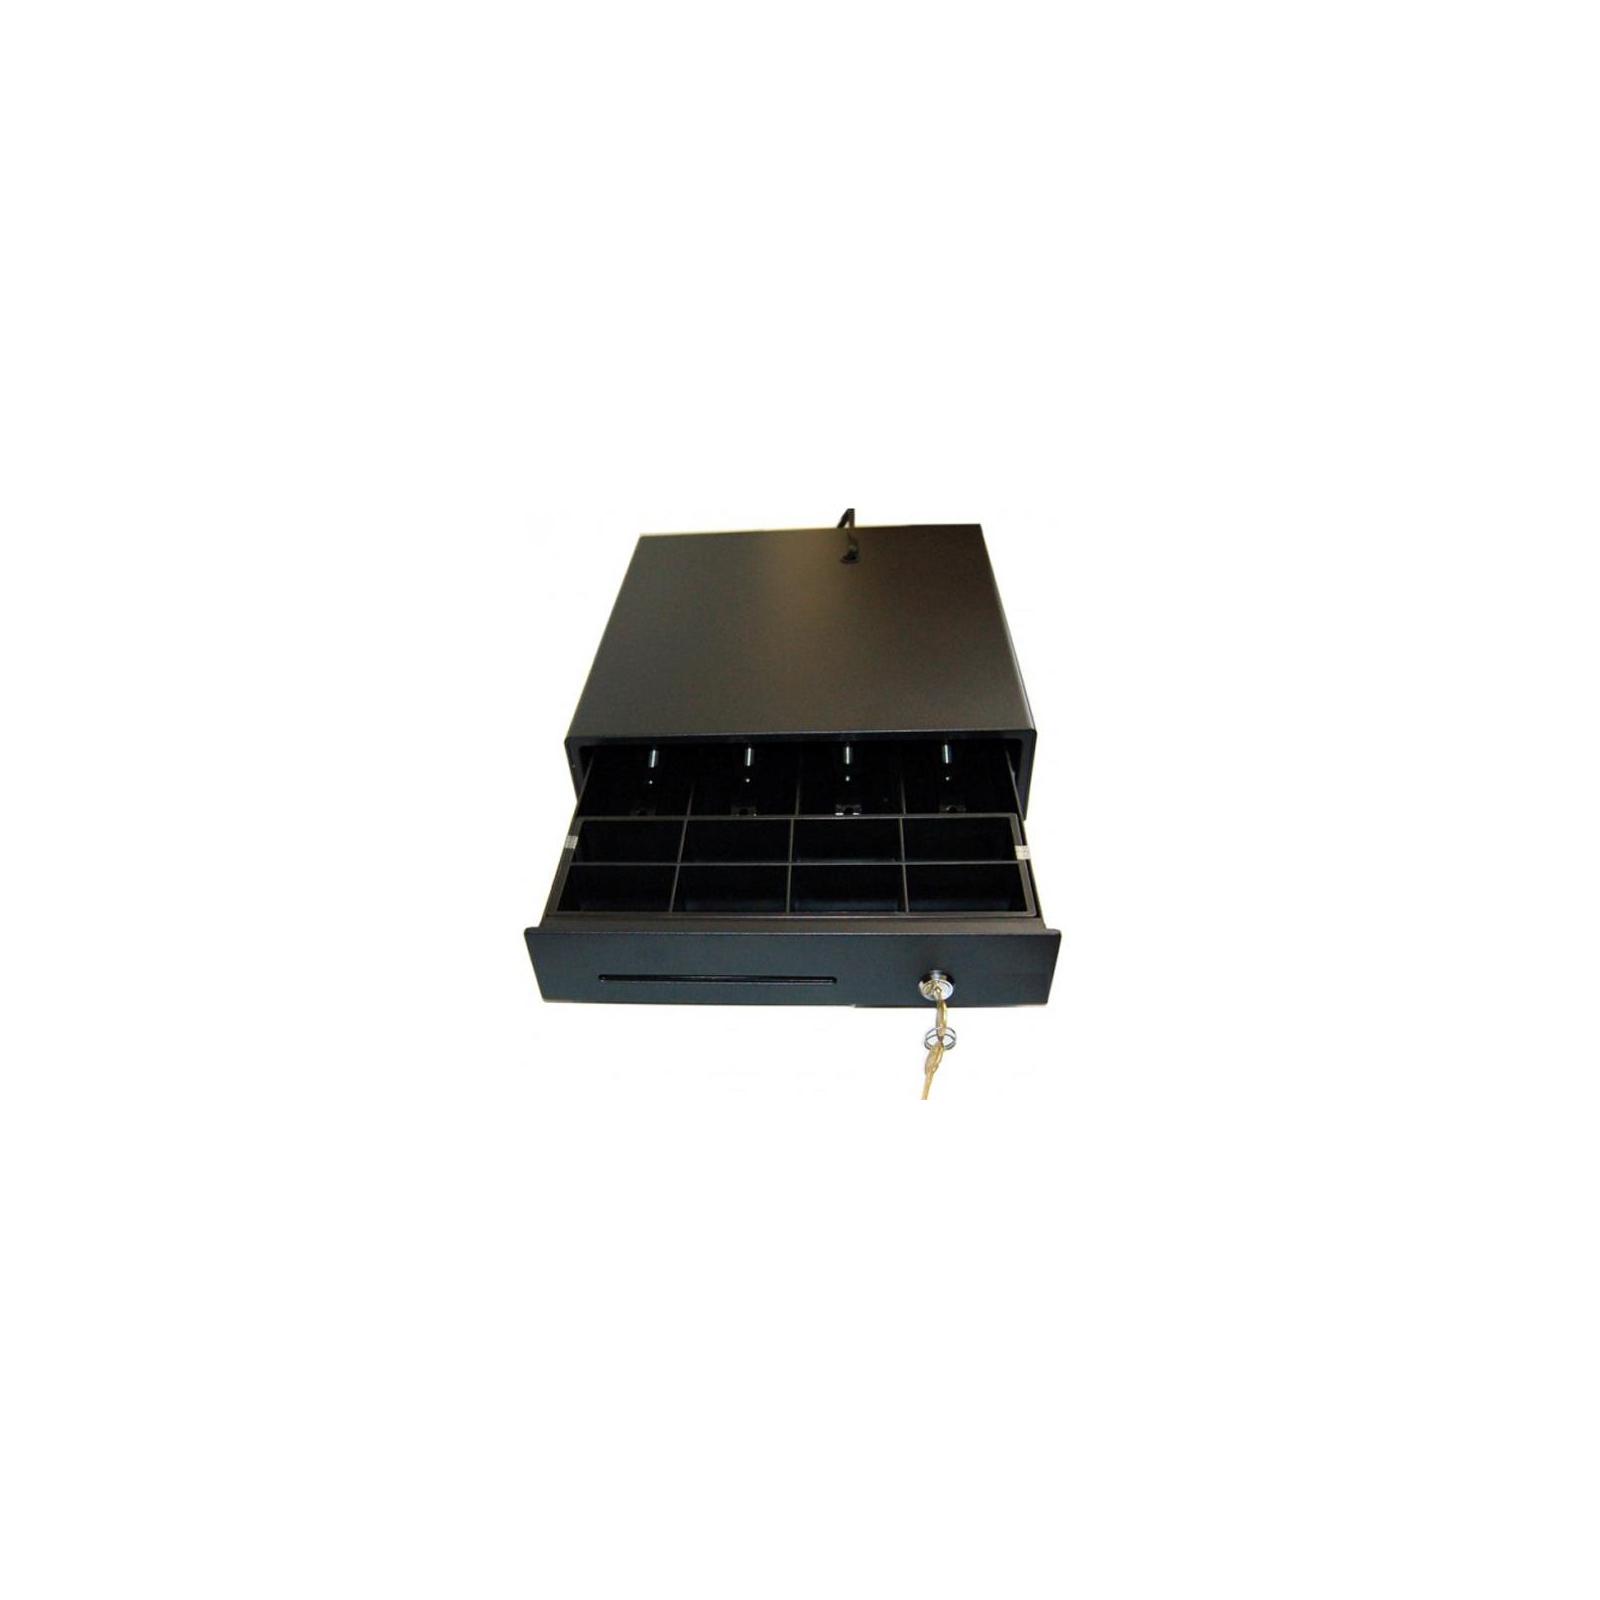 Денежный ящик ИКС-Маркет E3336D Black, 12V (E3336D BLACK 12V) изображение 2